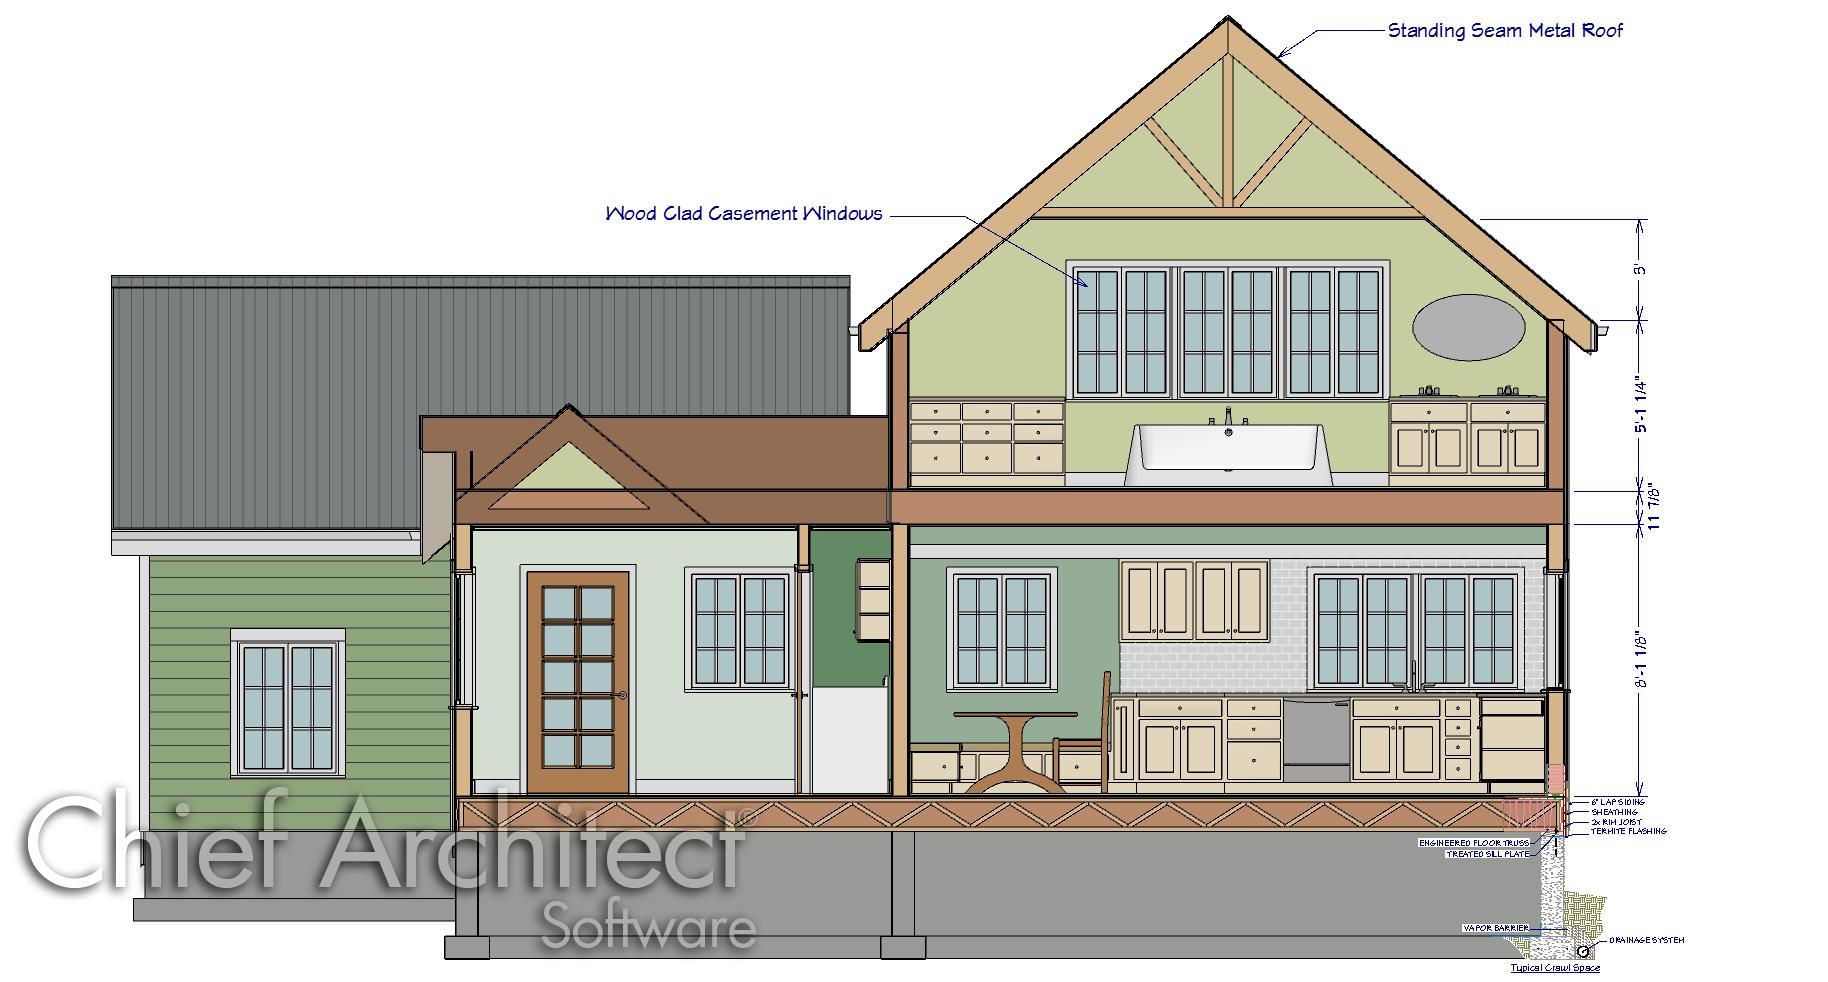 Home Designer Pro - Professional home designer